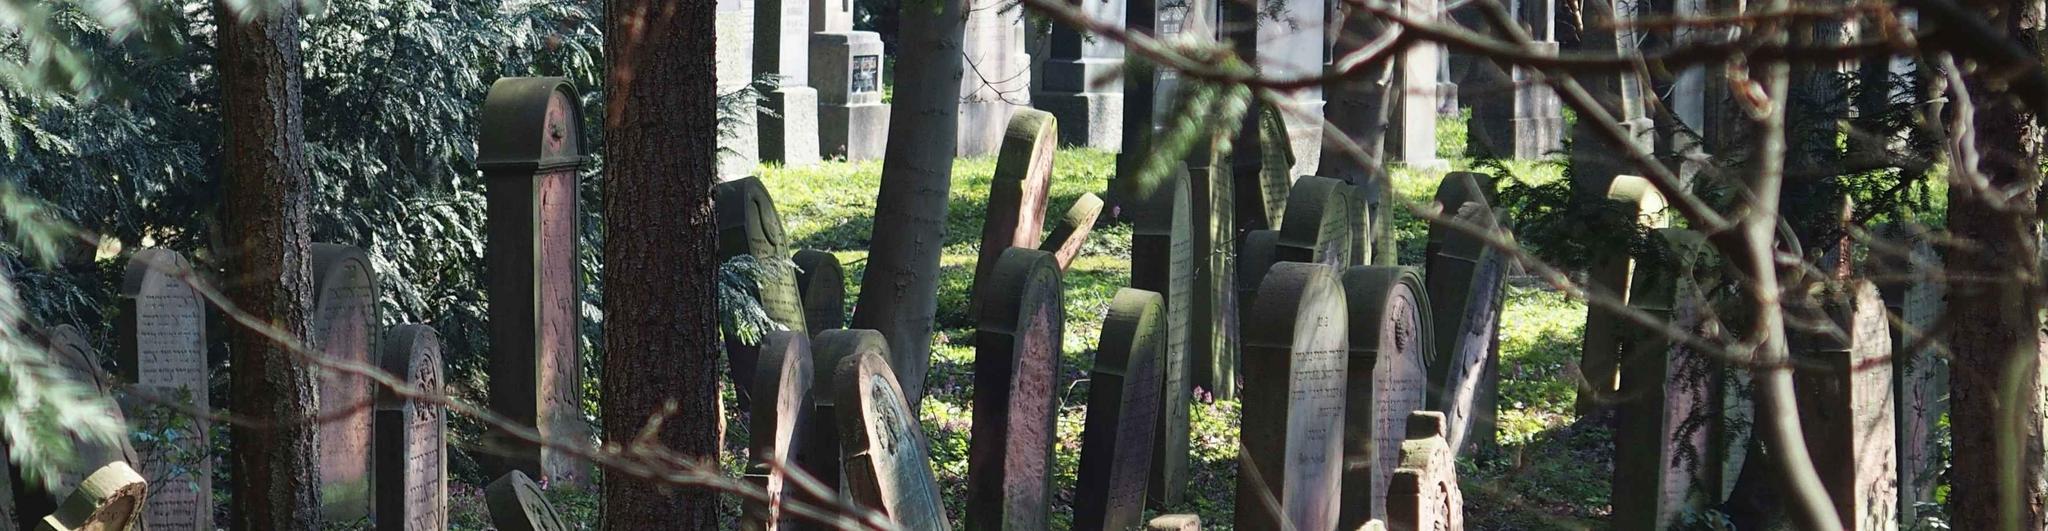 Jüdischer Friedhof Hanau